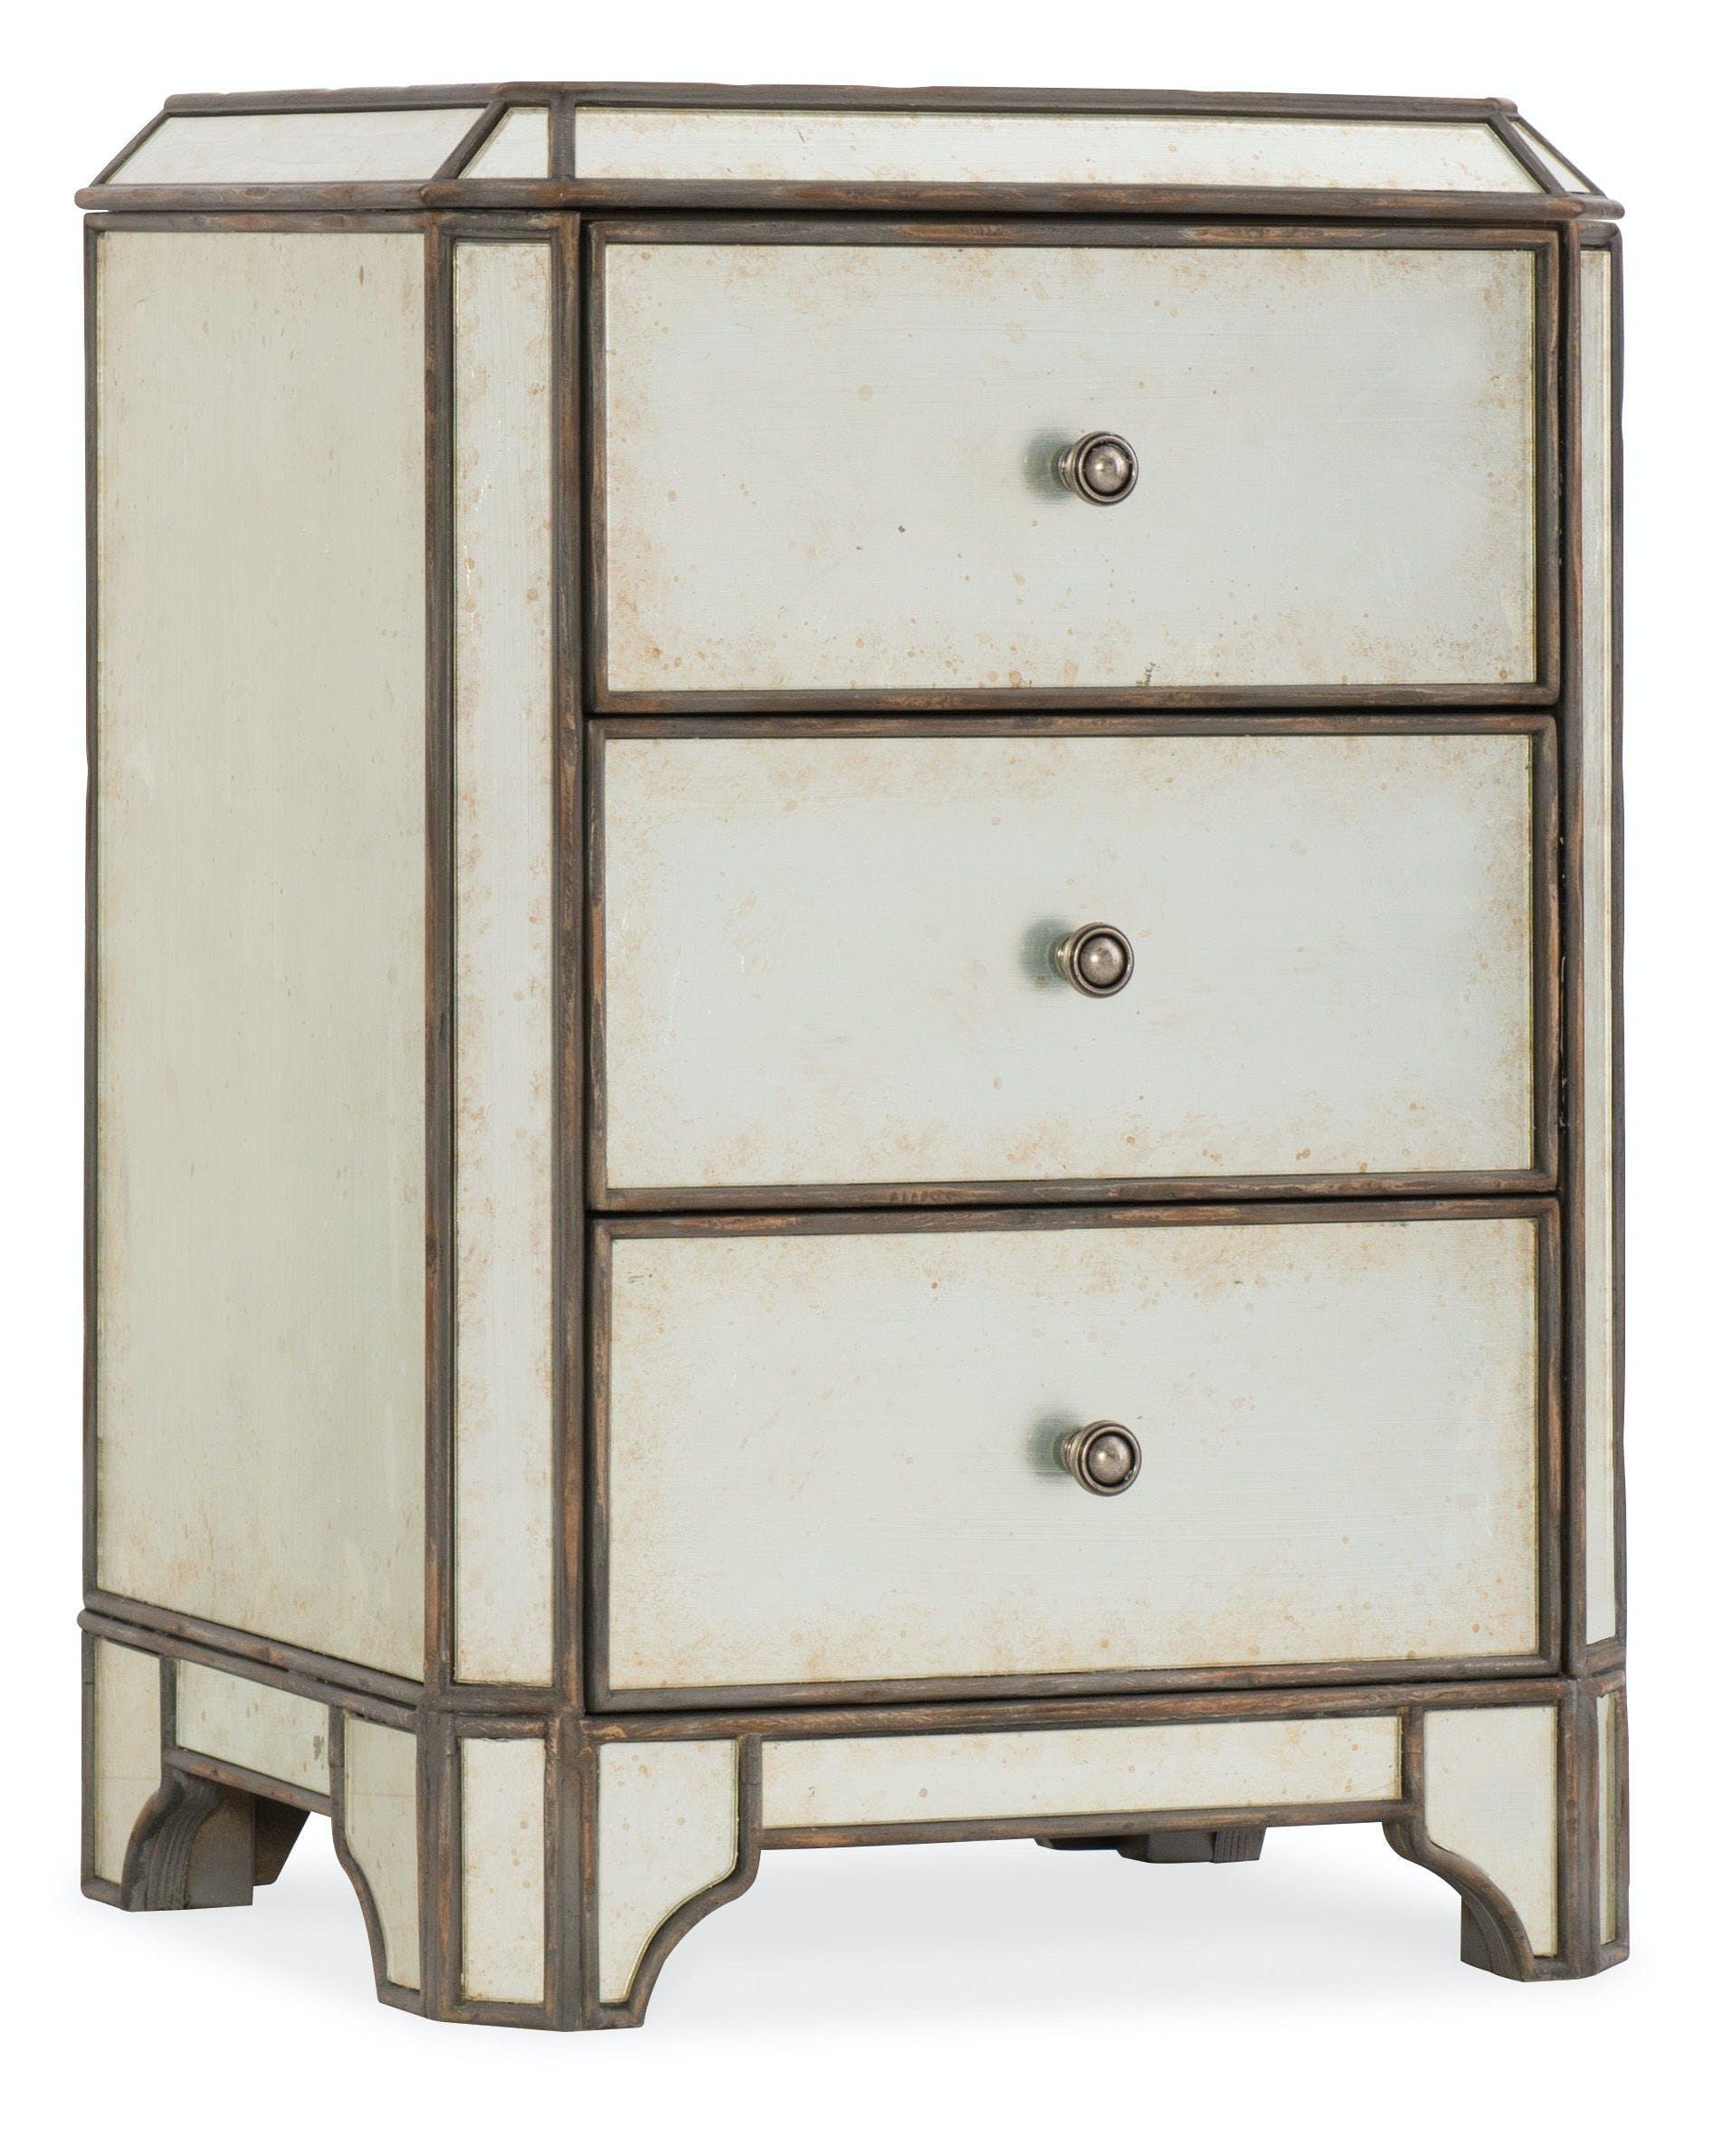 Hooker Furniture Bedroom Arabella Mirrored Three Drawer